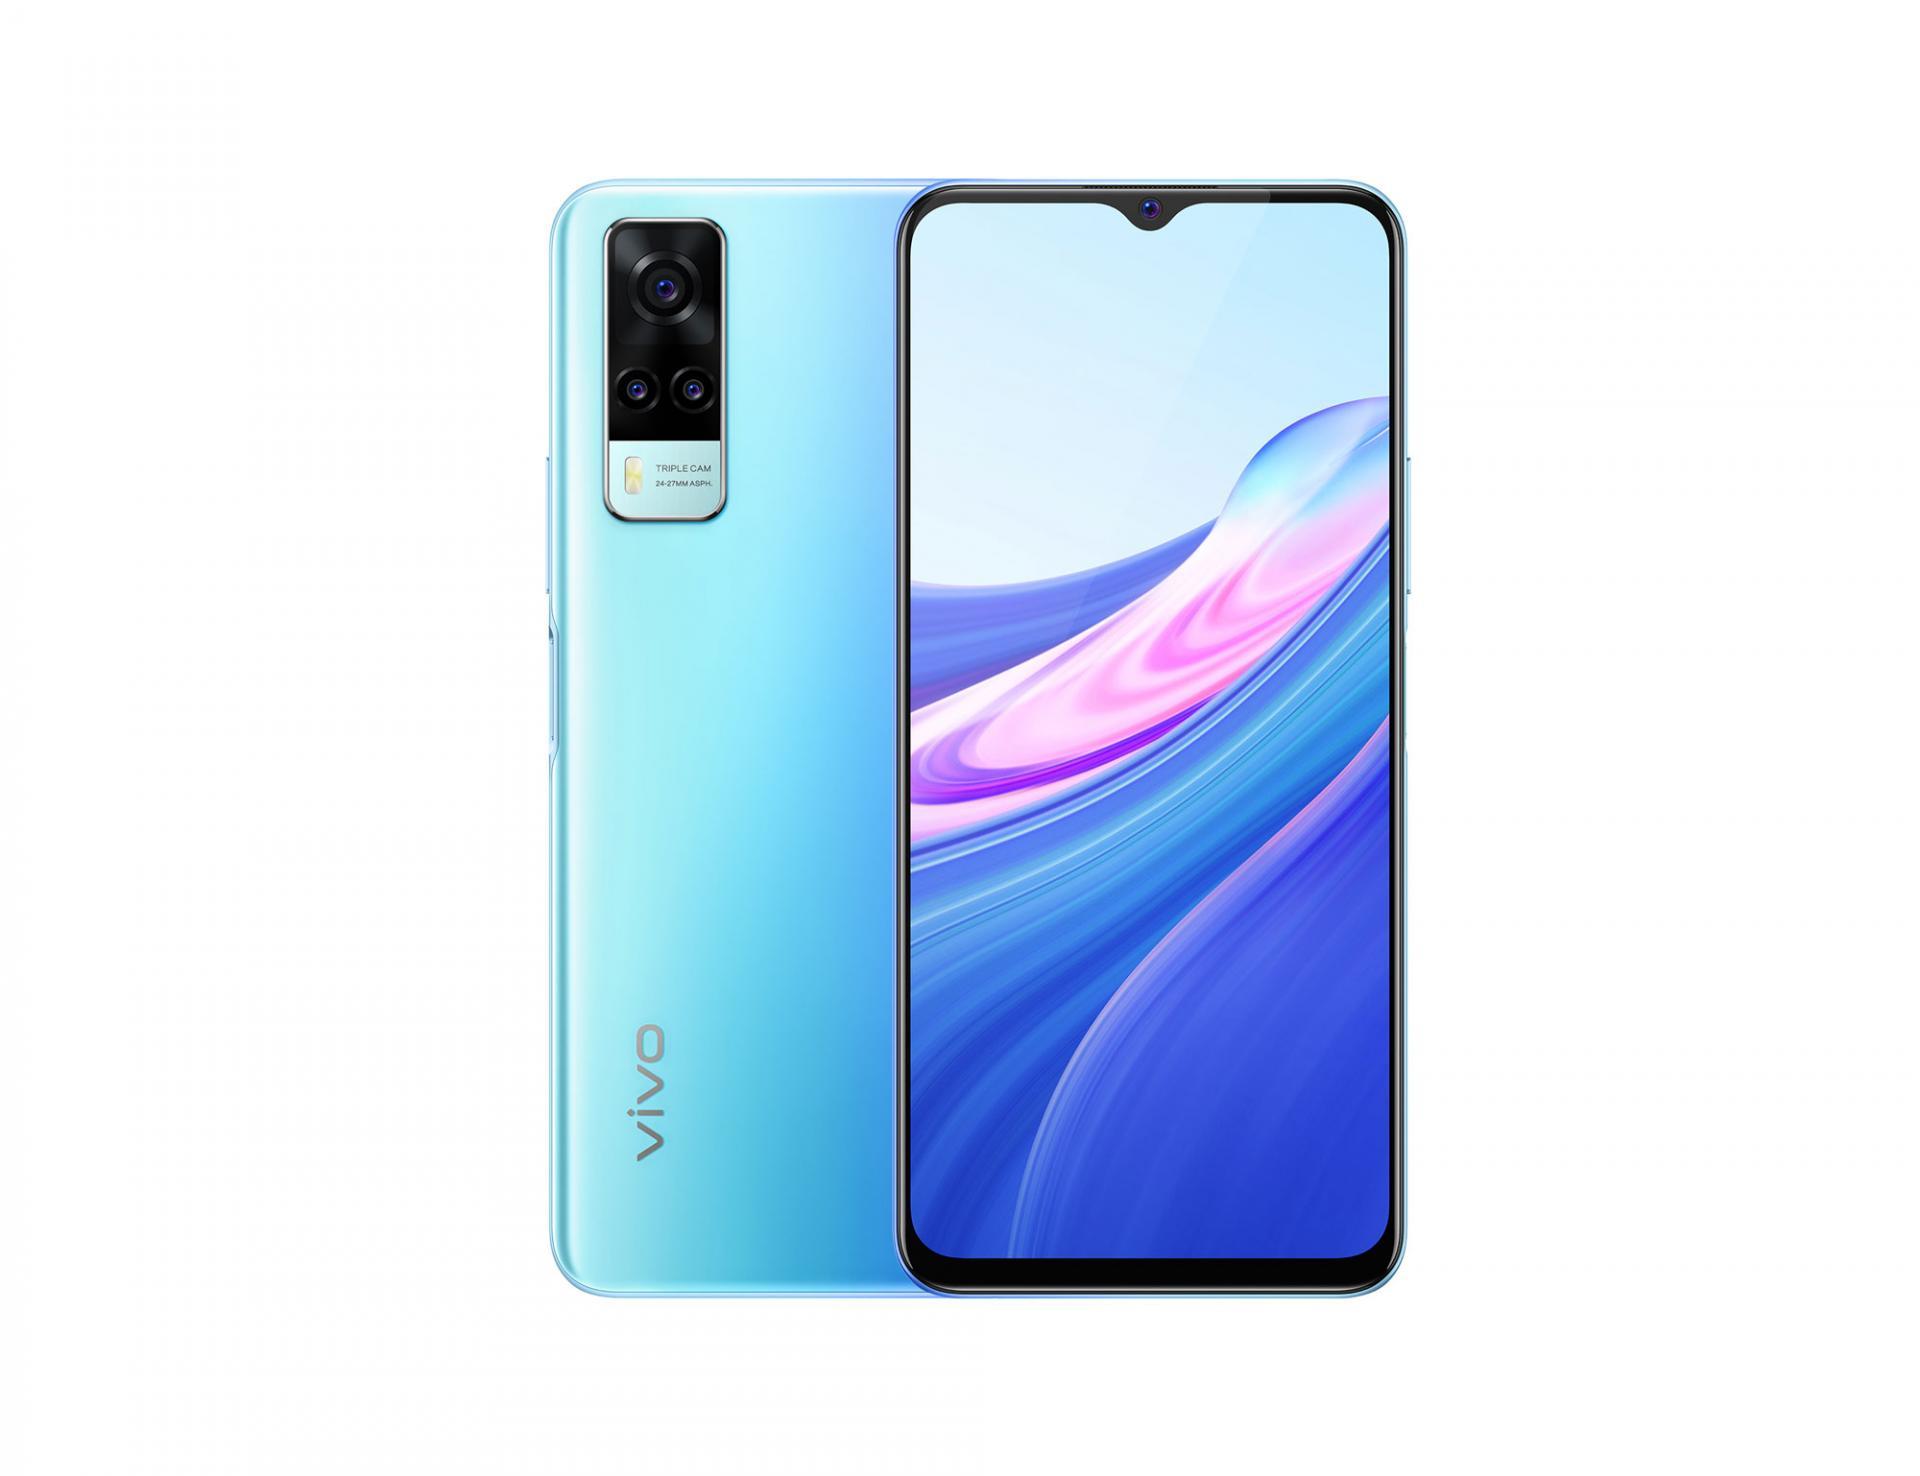 Смартфон vivo Y31 появился за 17 тысяч рублей сразу на Android 11